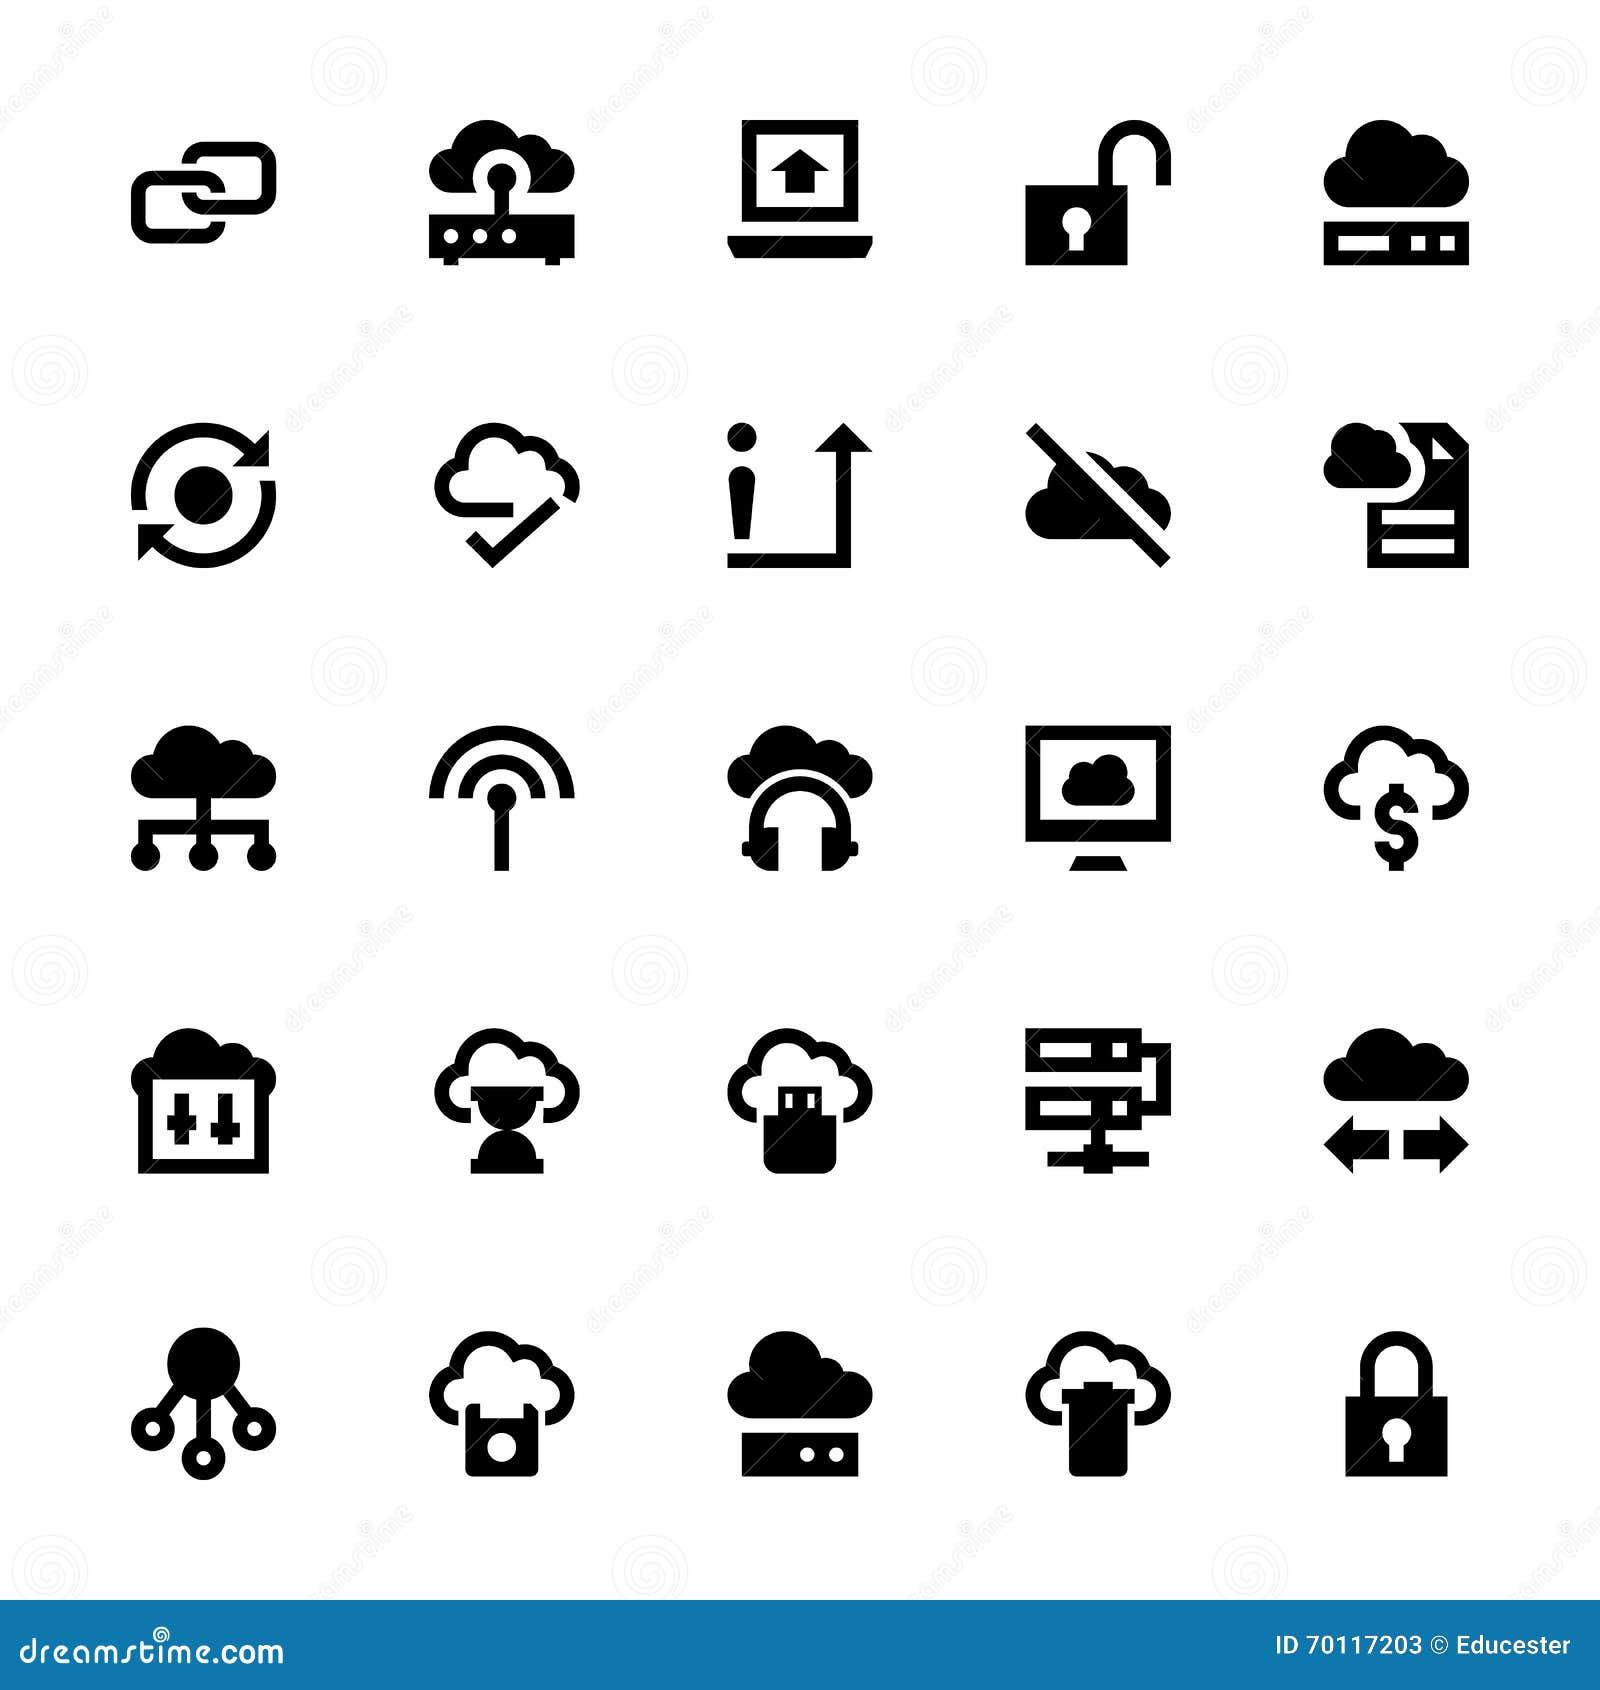 cloud data technology vector icons 3 stock illustration